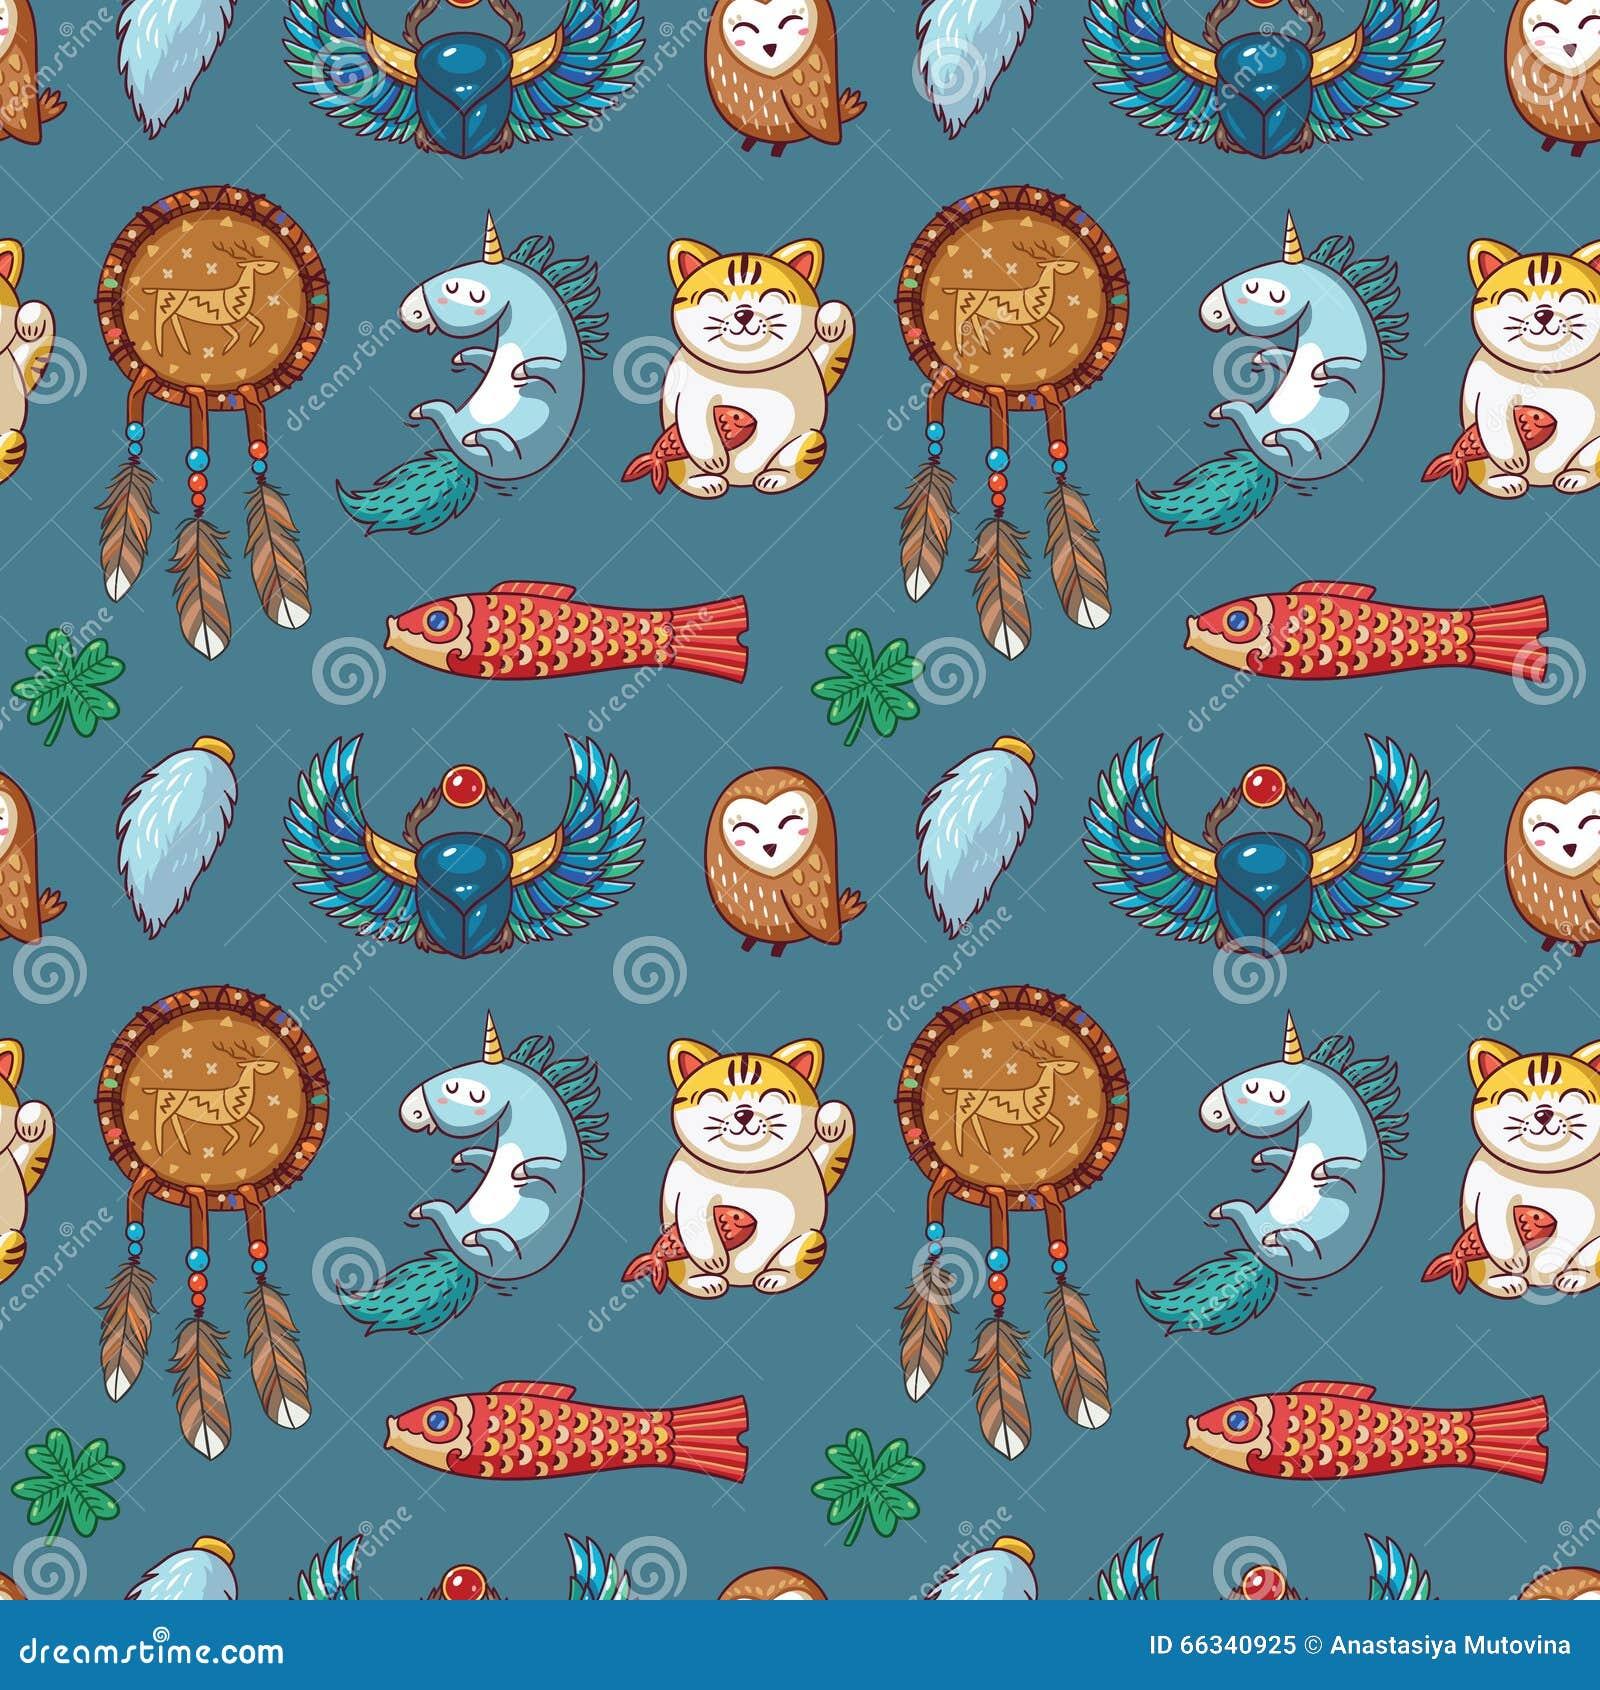 41000-45 1 demi mètres kota batik tissu